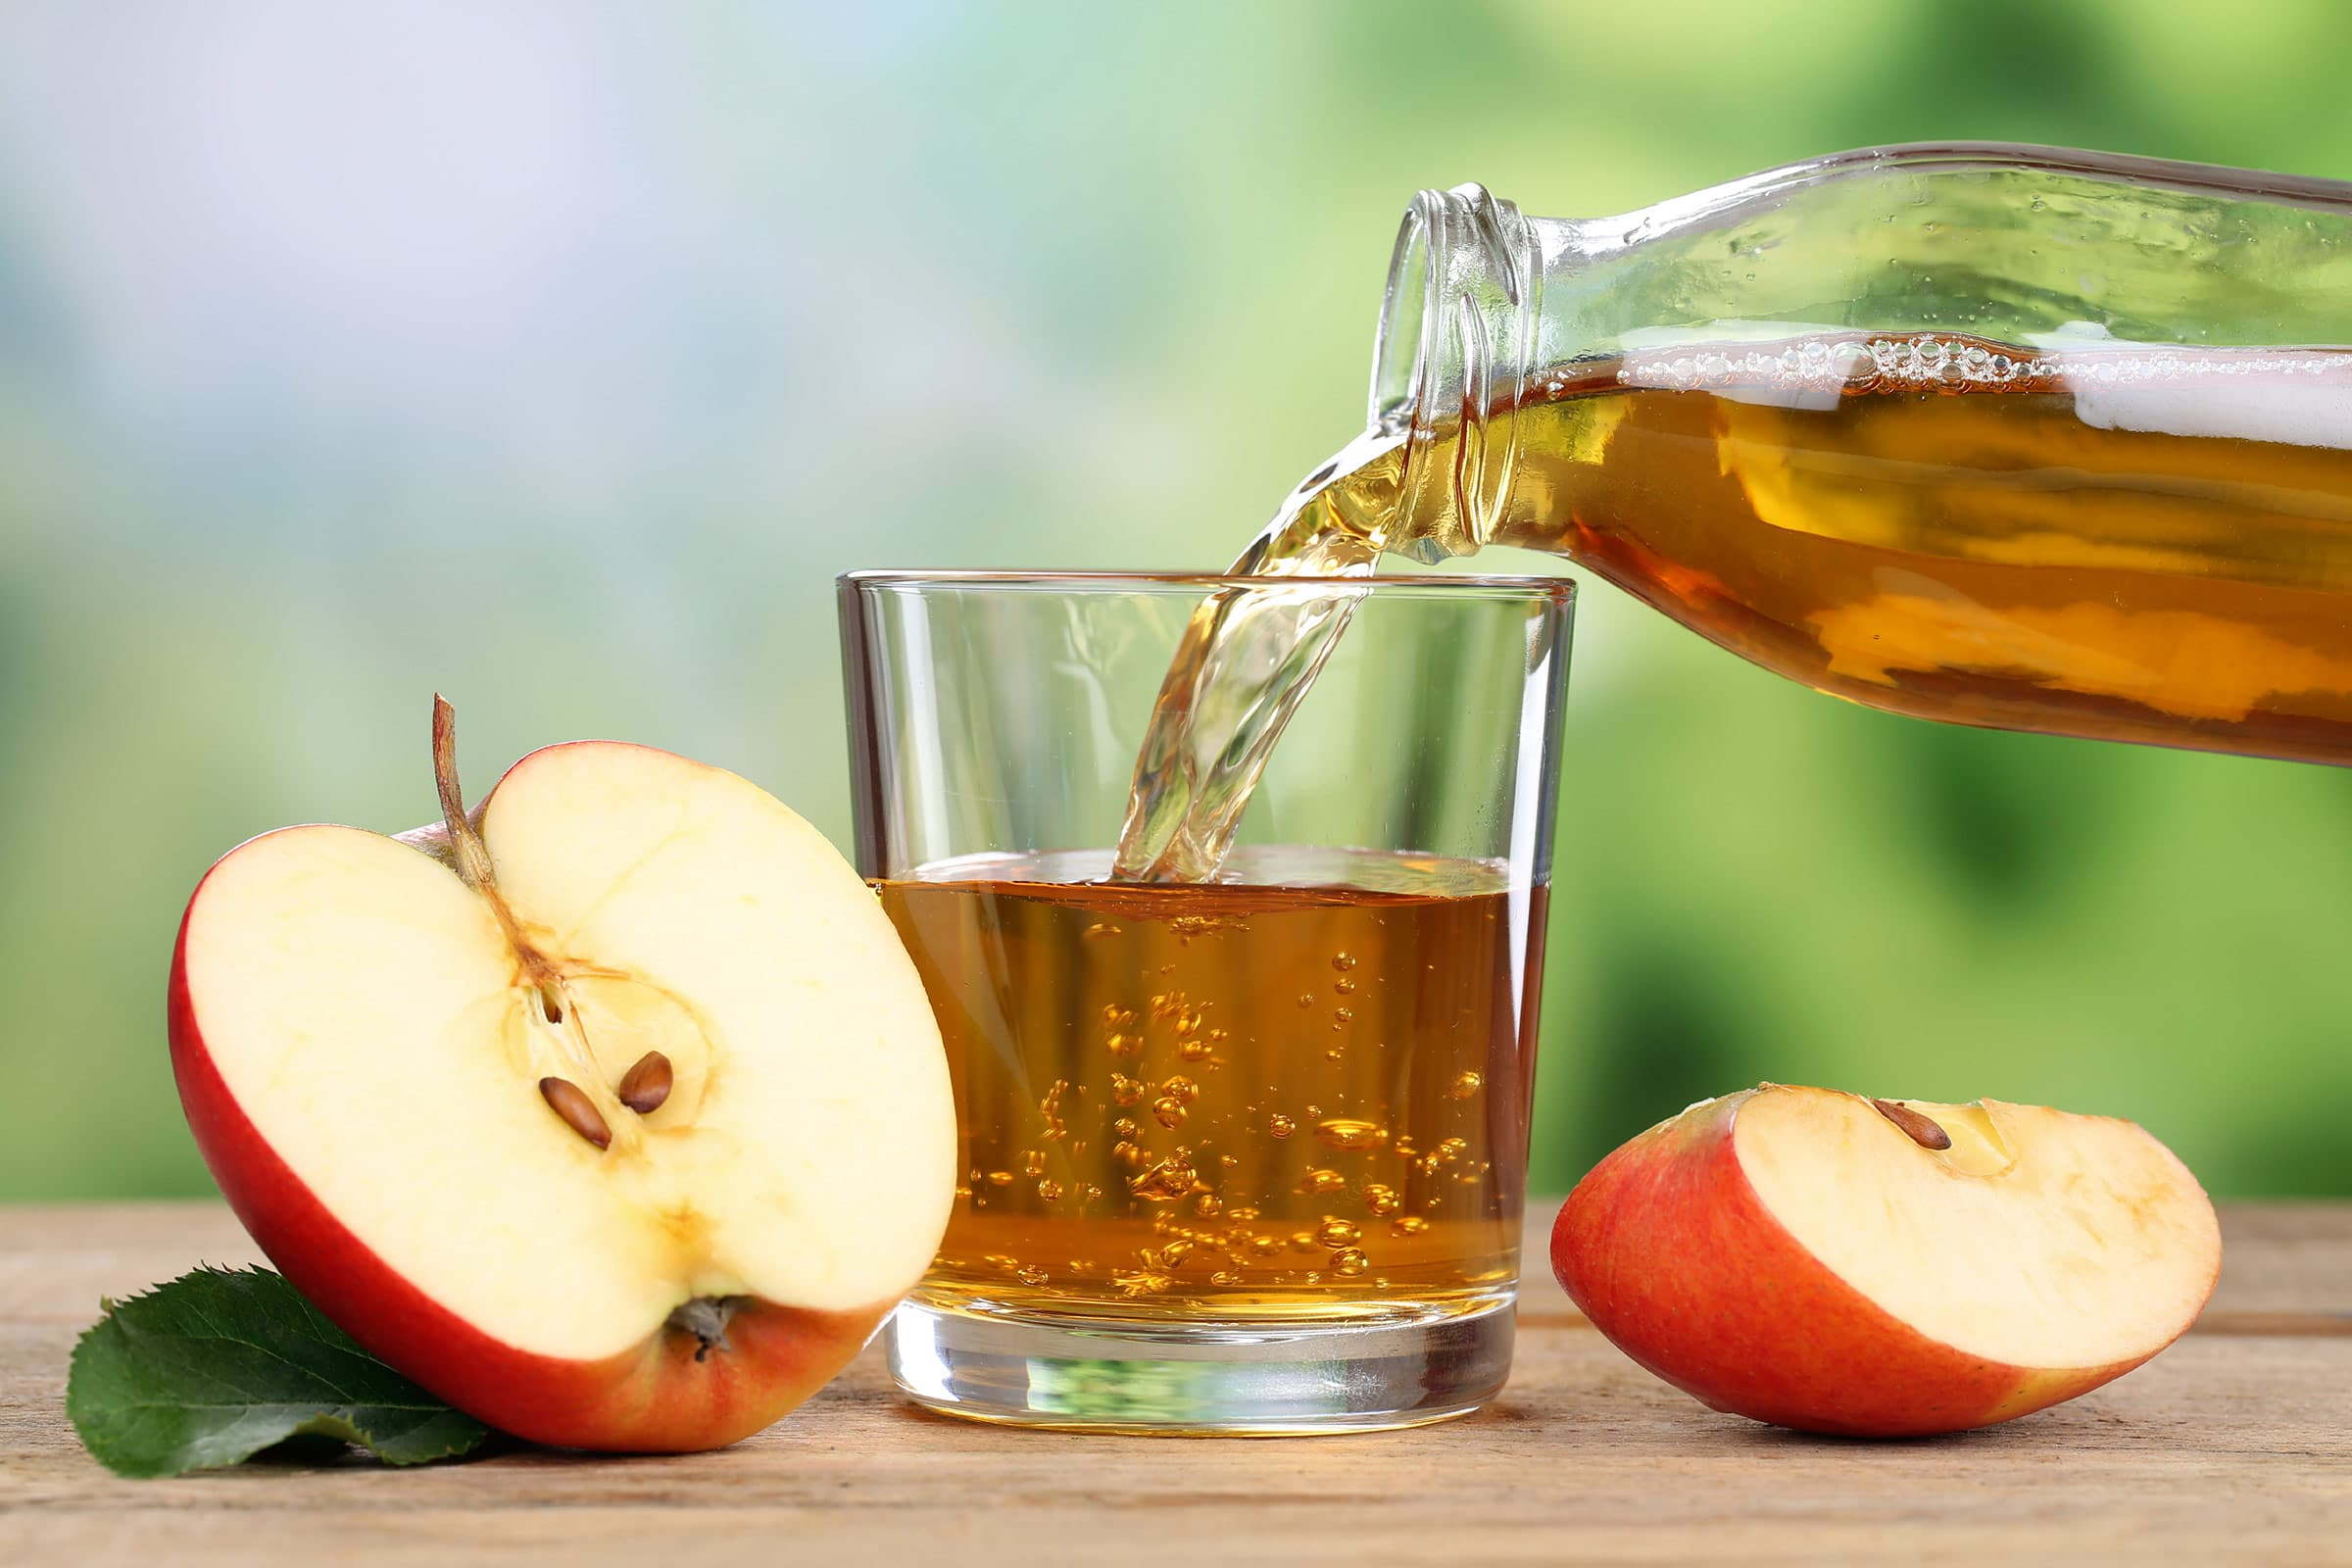 20 Ways to Use Apple Cider Vinegar16